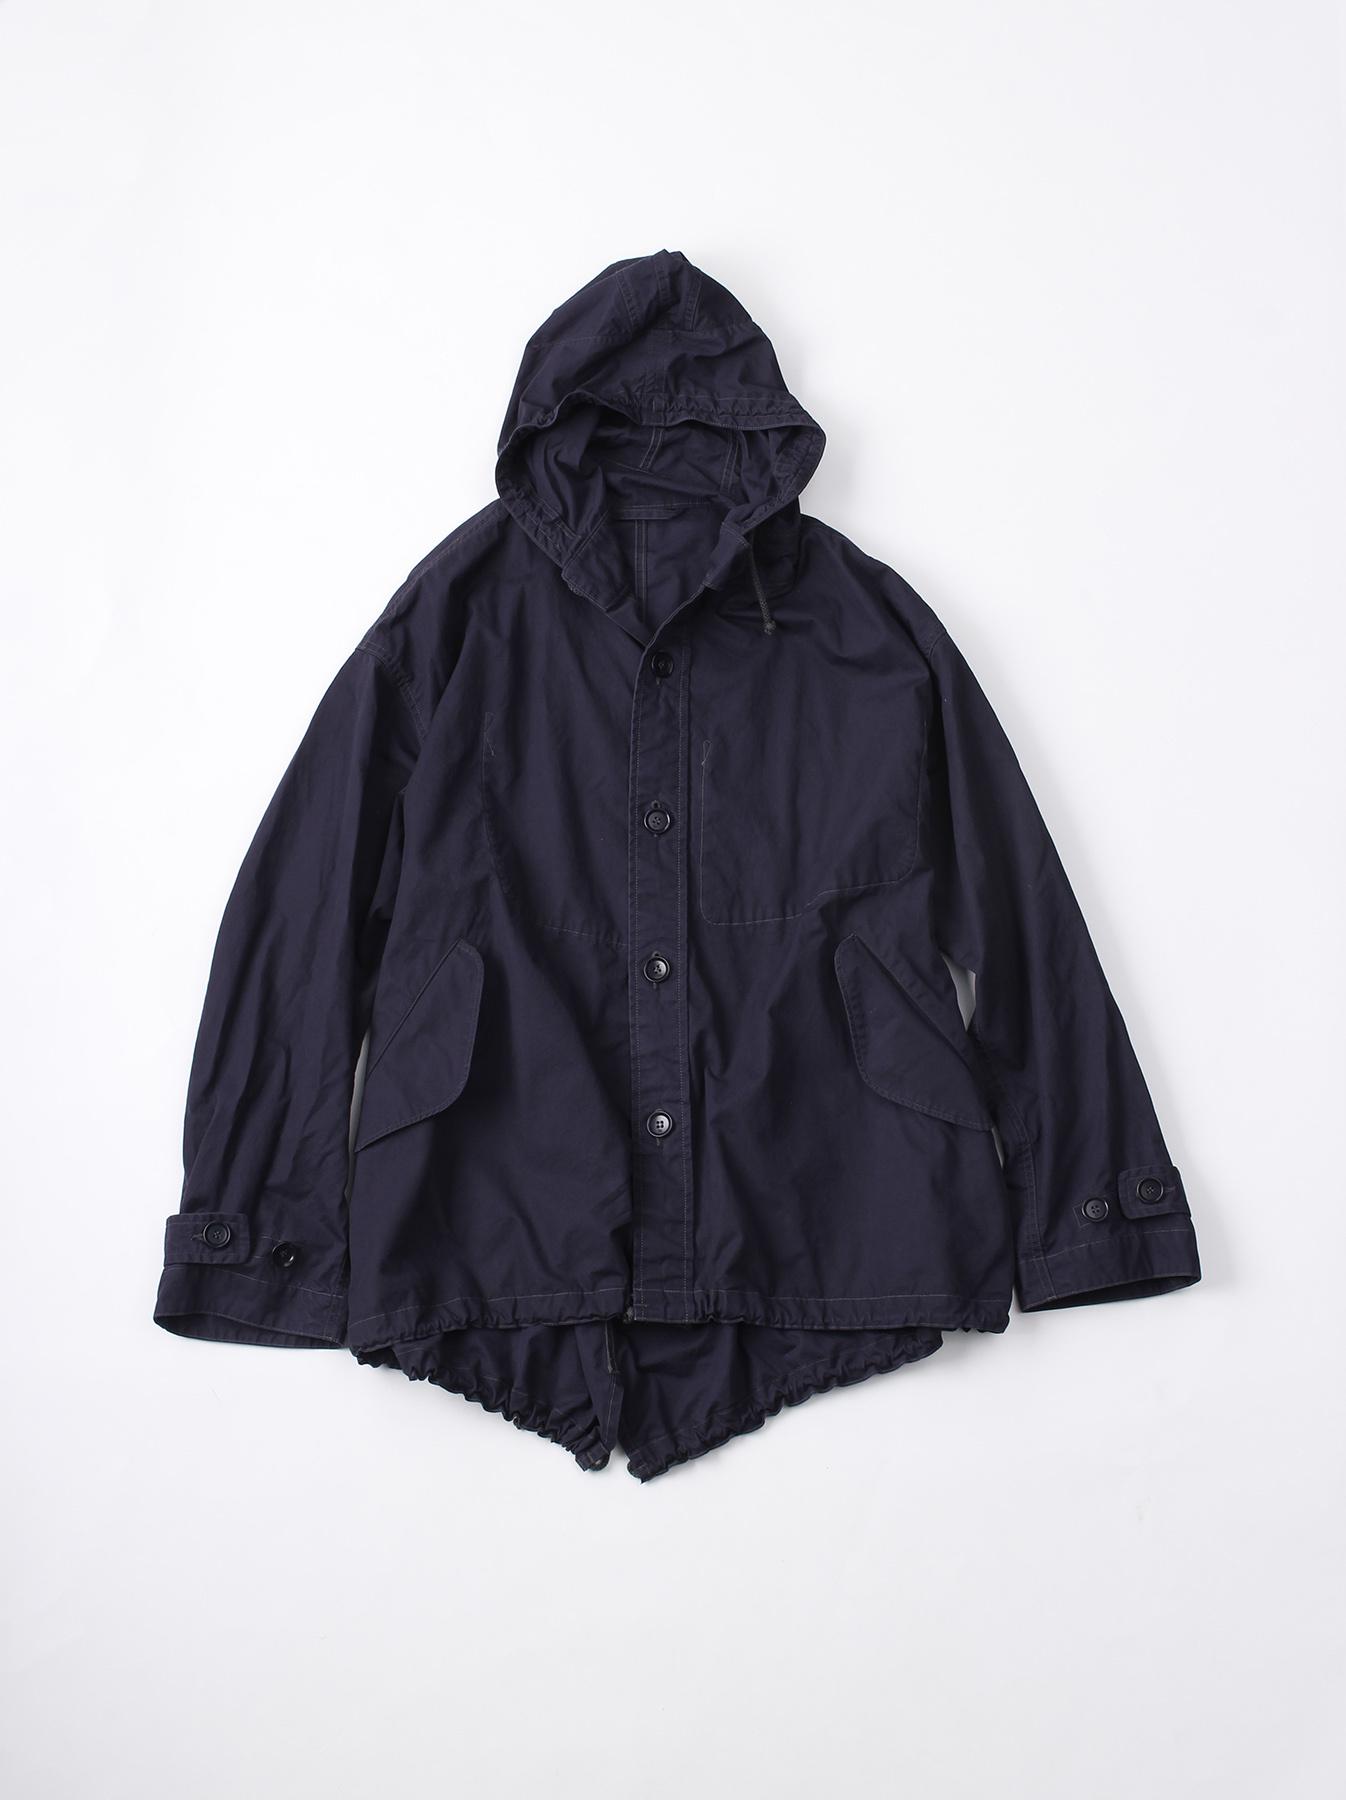 Weather Cloth Umahiko Mods Hoodie-1